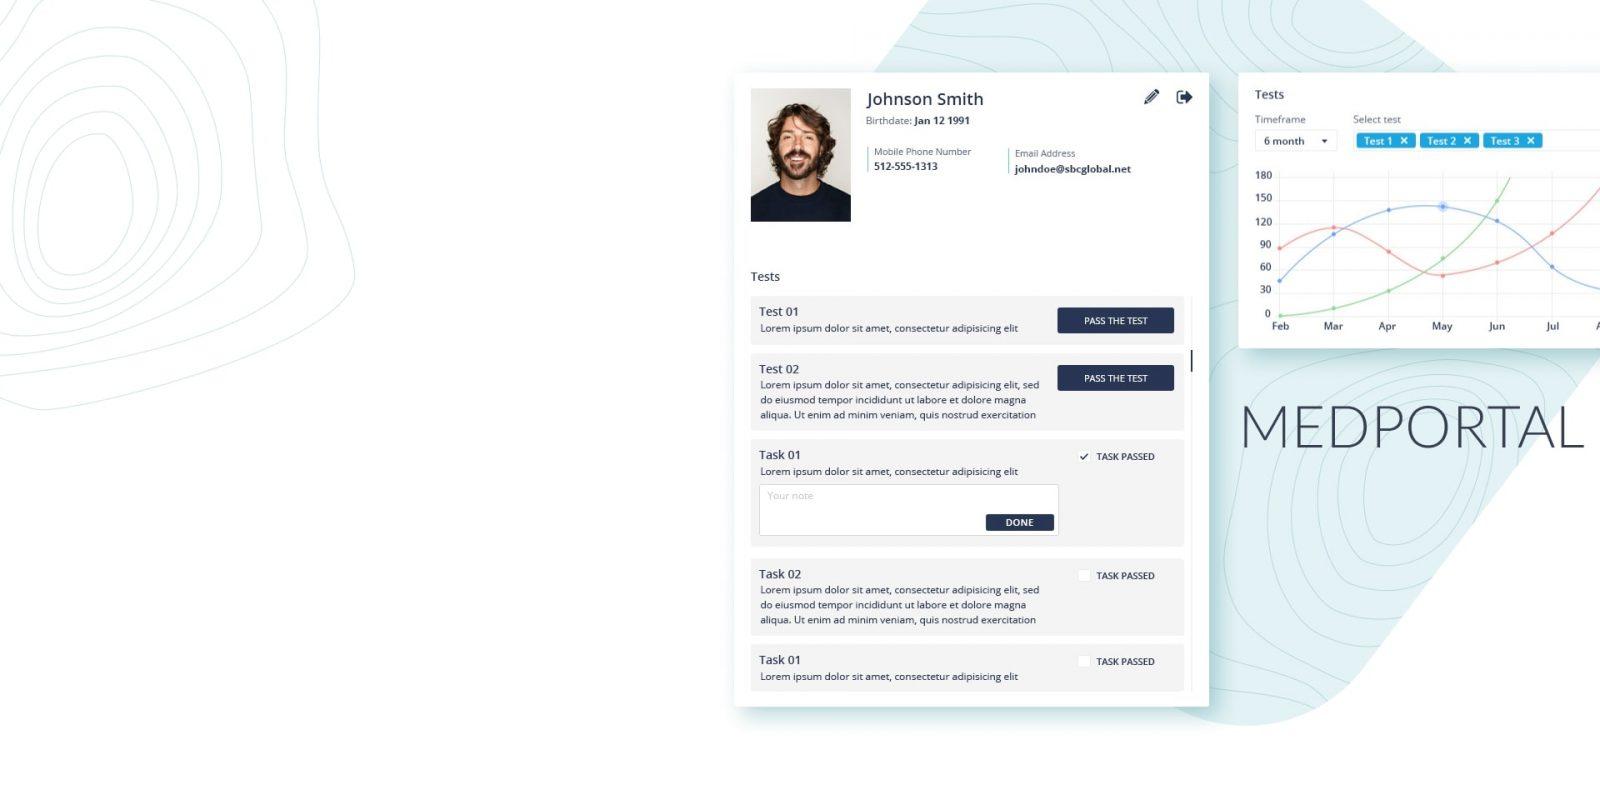 Mental health monitoring platform